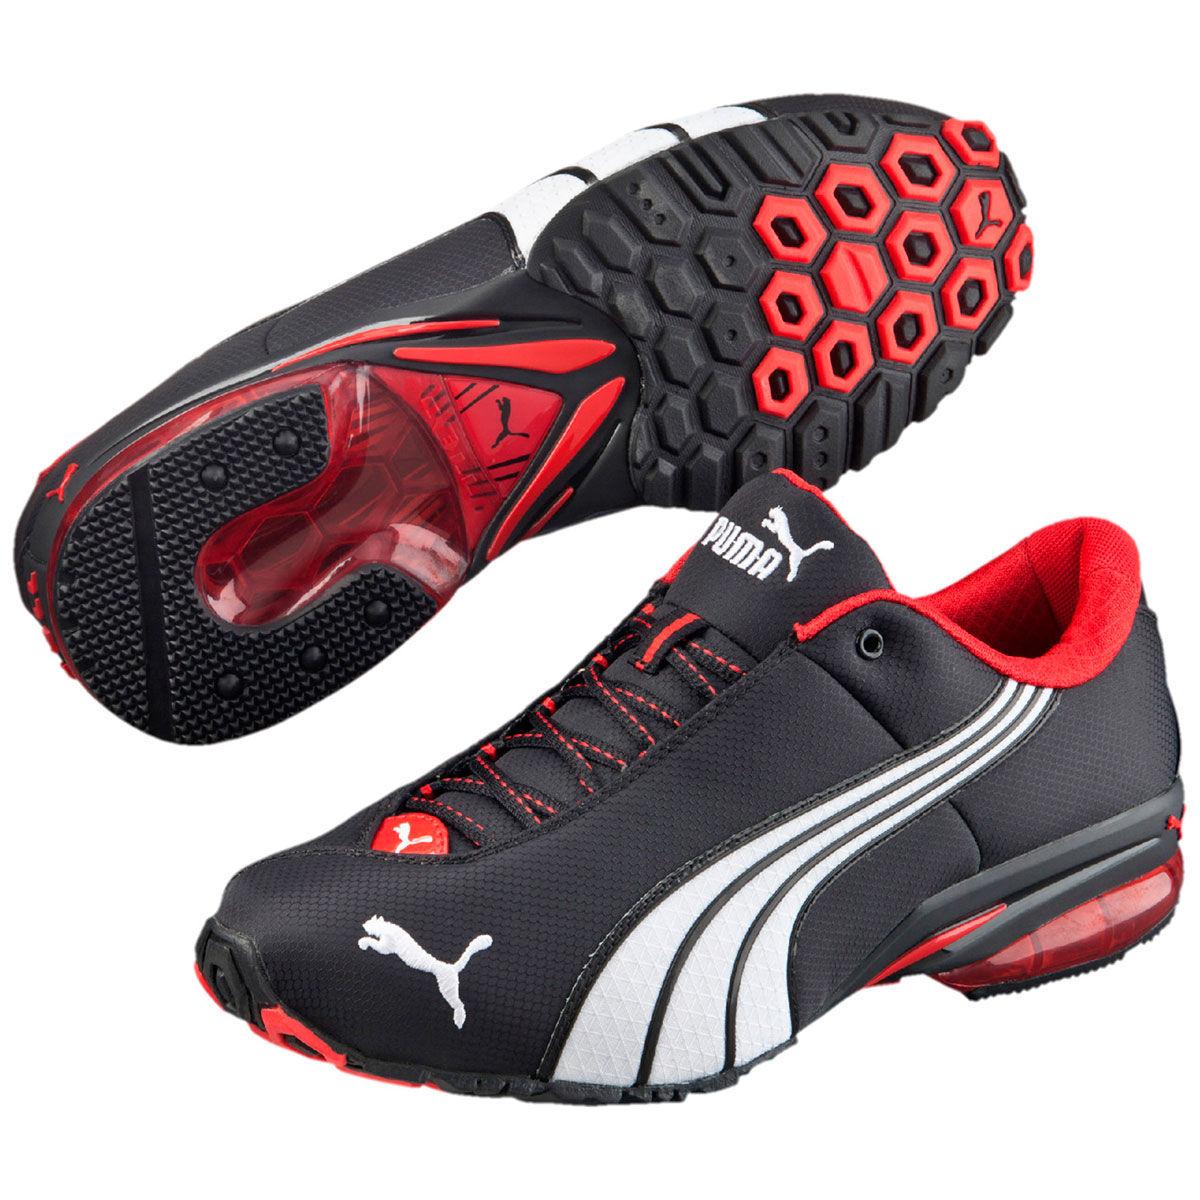 PUMA Men's Jago Nylon Sneakers - Bob's